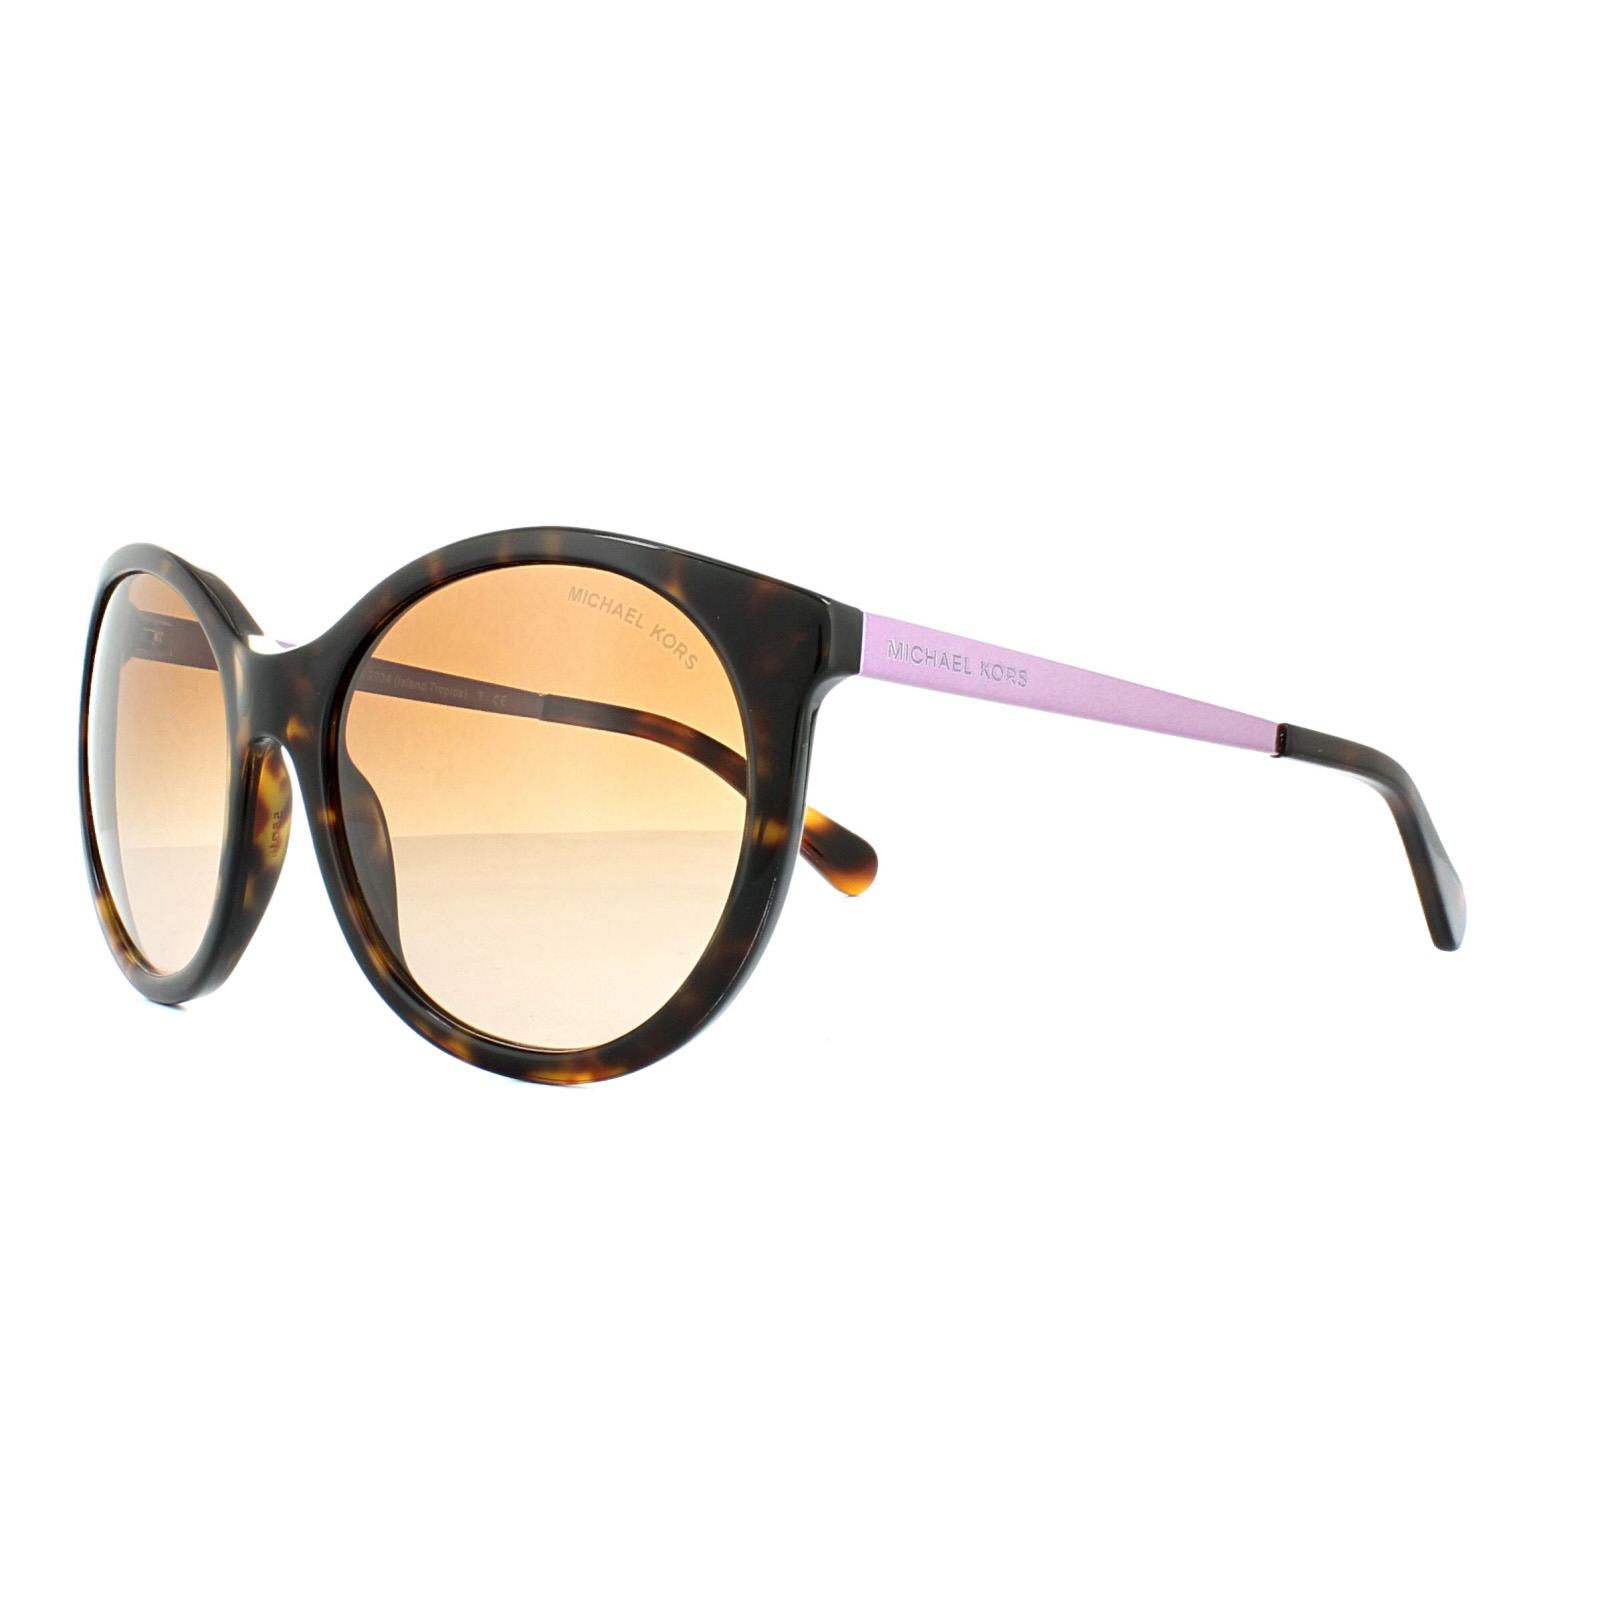 835d8f3b17 Michael Kors Sunglasses Island Tropics 2034 3200 13 Dark Havana ...